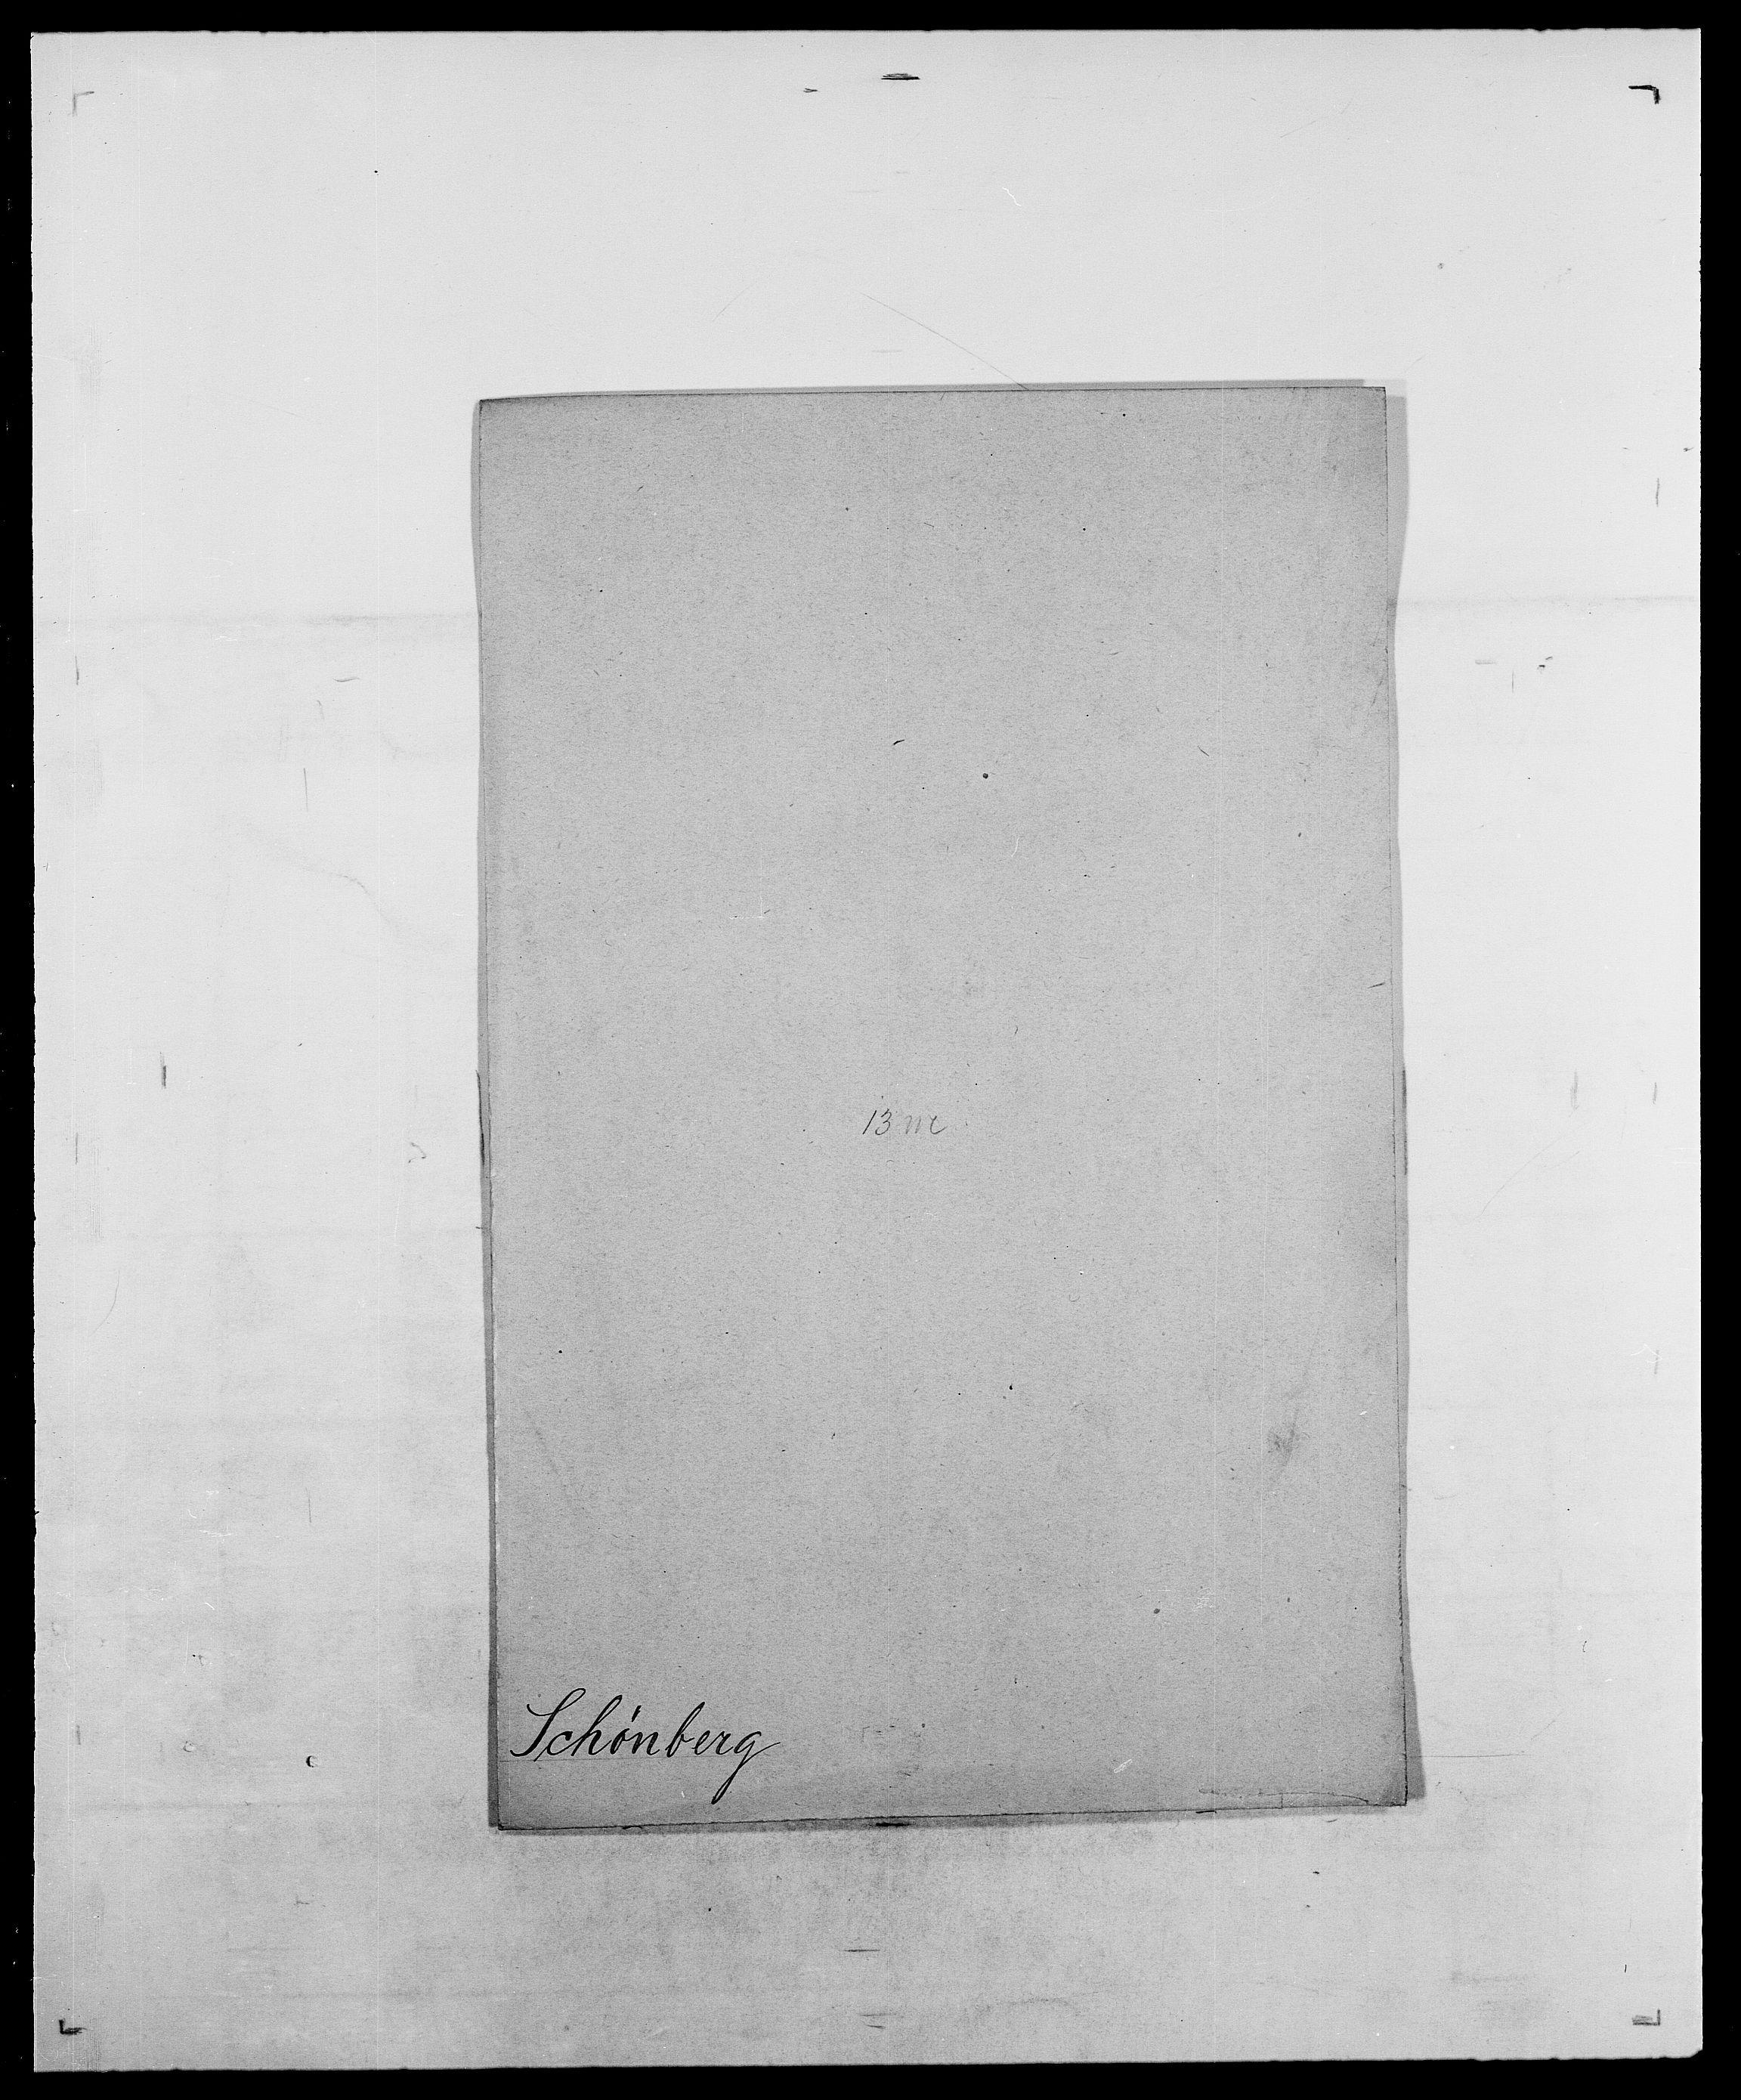 SAO, Delgobe, Charles Antoine - samling, D/Da/L0035: Schnabel - sjetman, s. 468